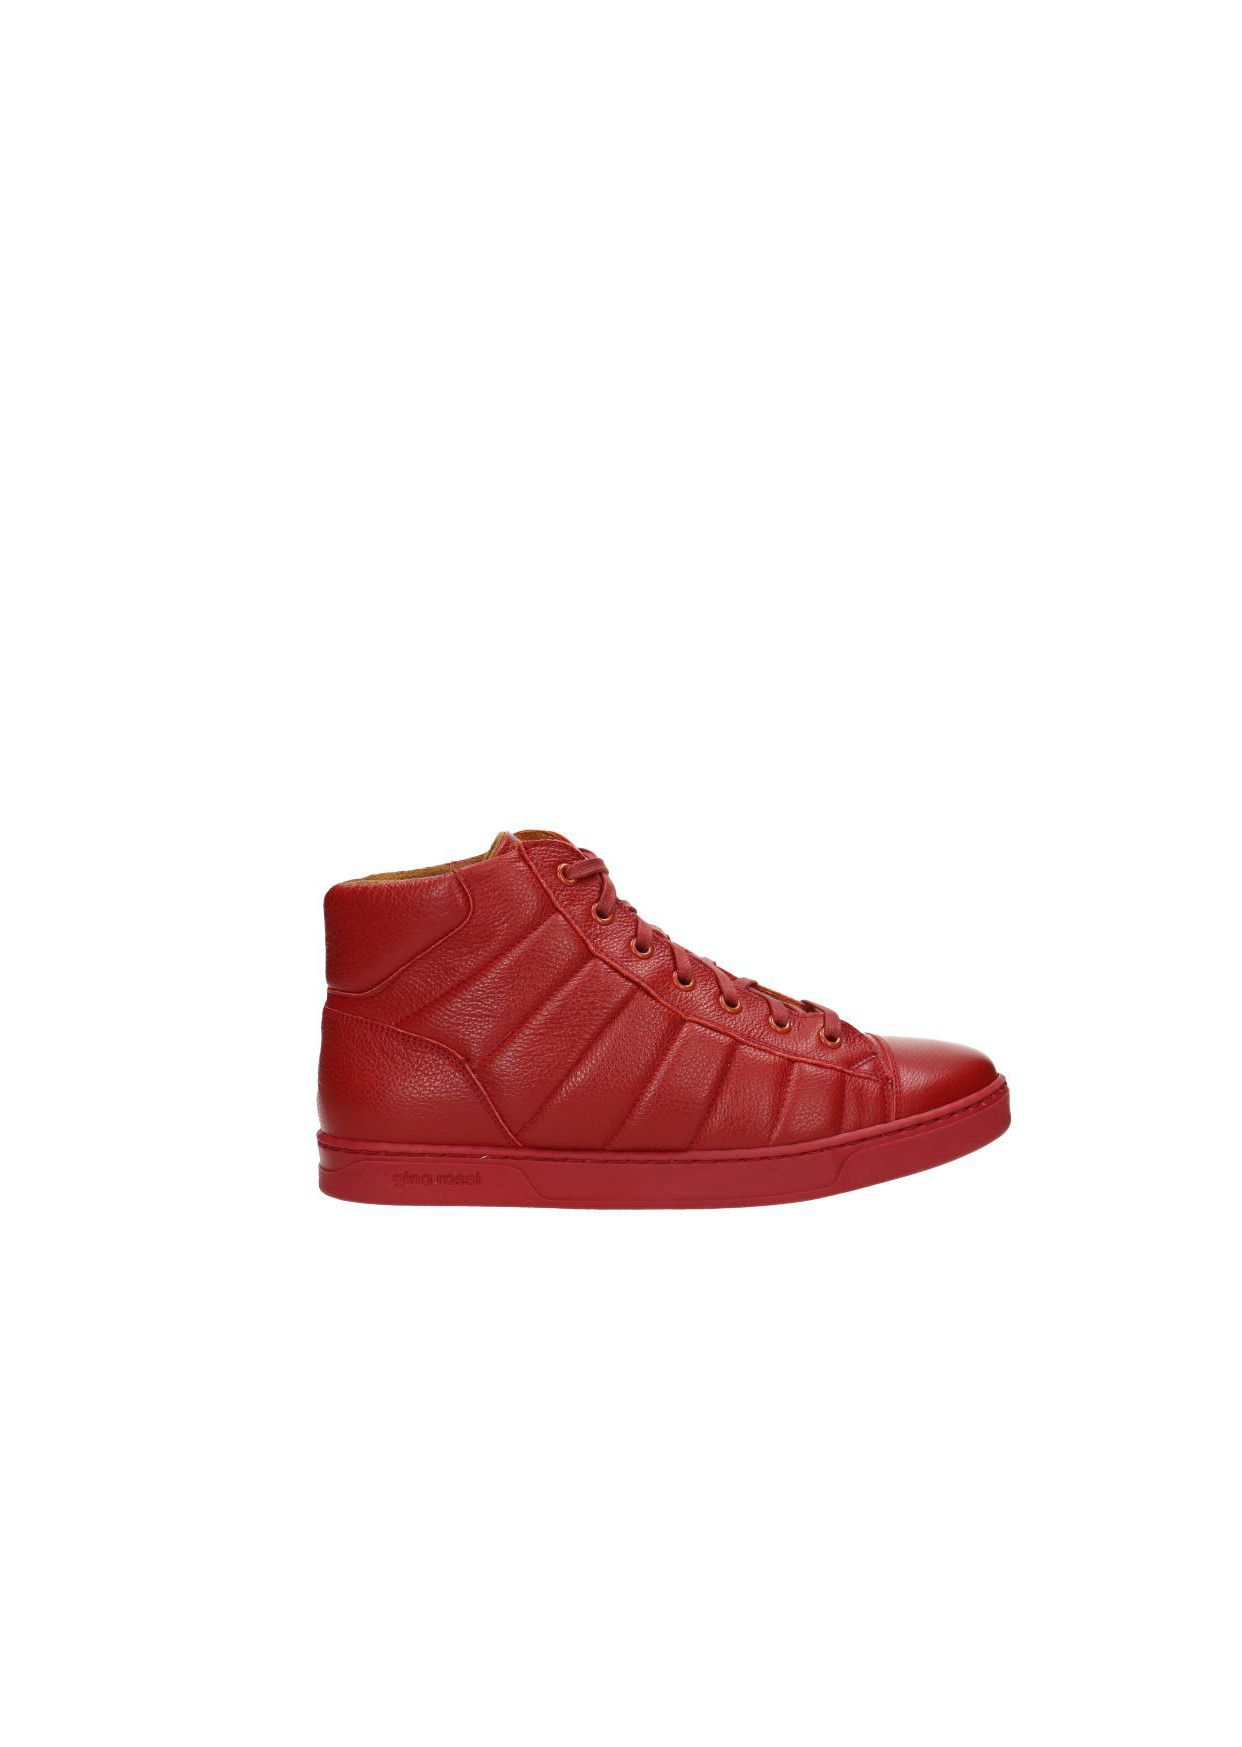 Kolekcja Jesien Zima 2016 W Gino Rossi Ginorossi Jesien Zima Adidas Sneakers Sneakers Fashion